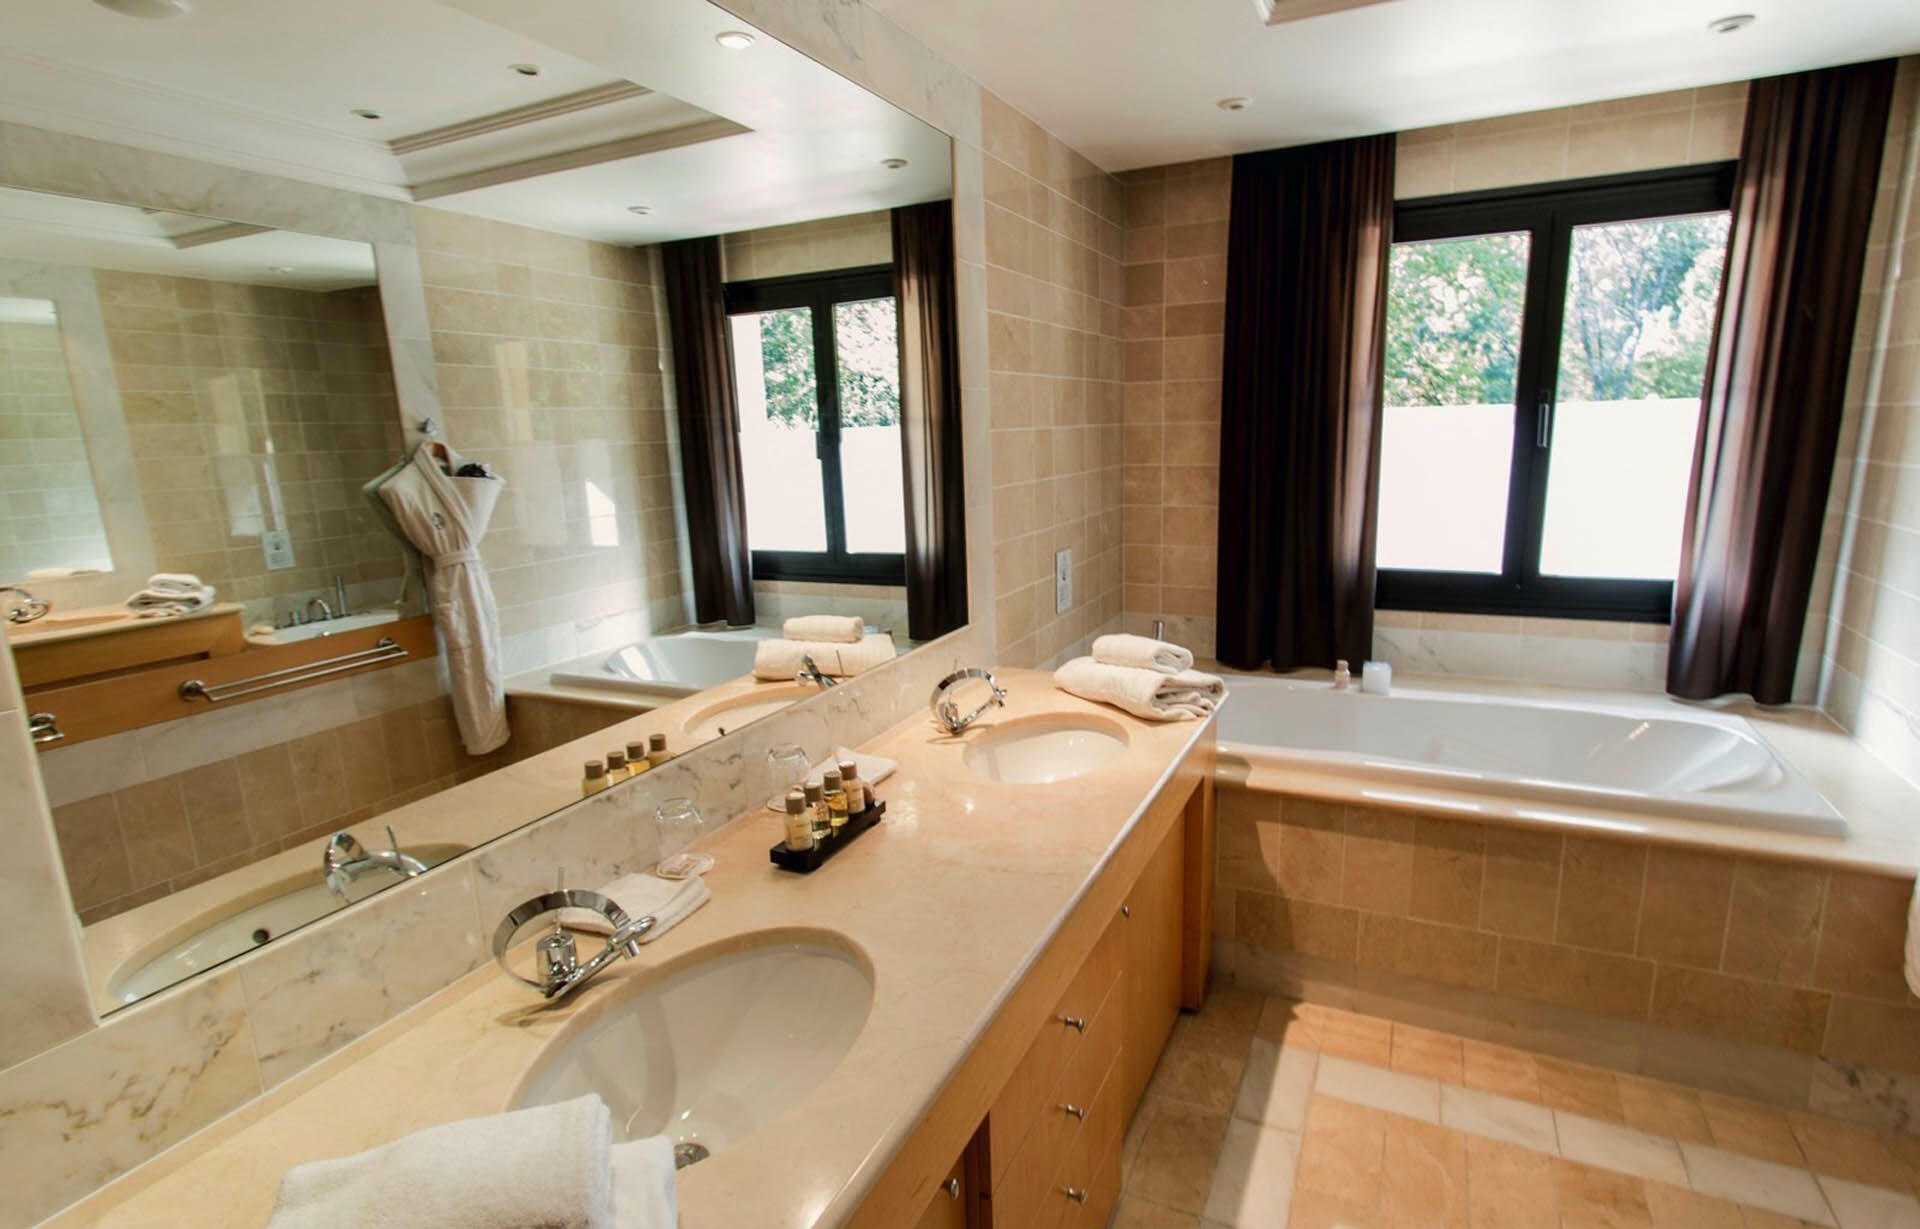 Bathroom at Hotel & Spa Le Pavillon near Lyon